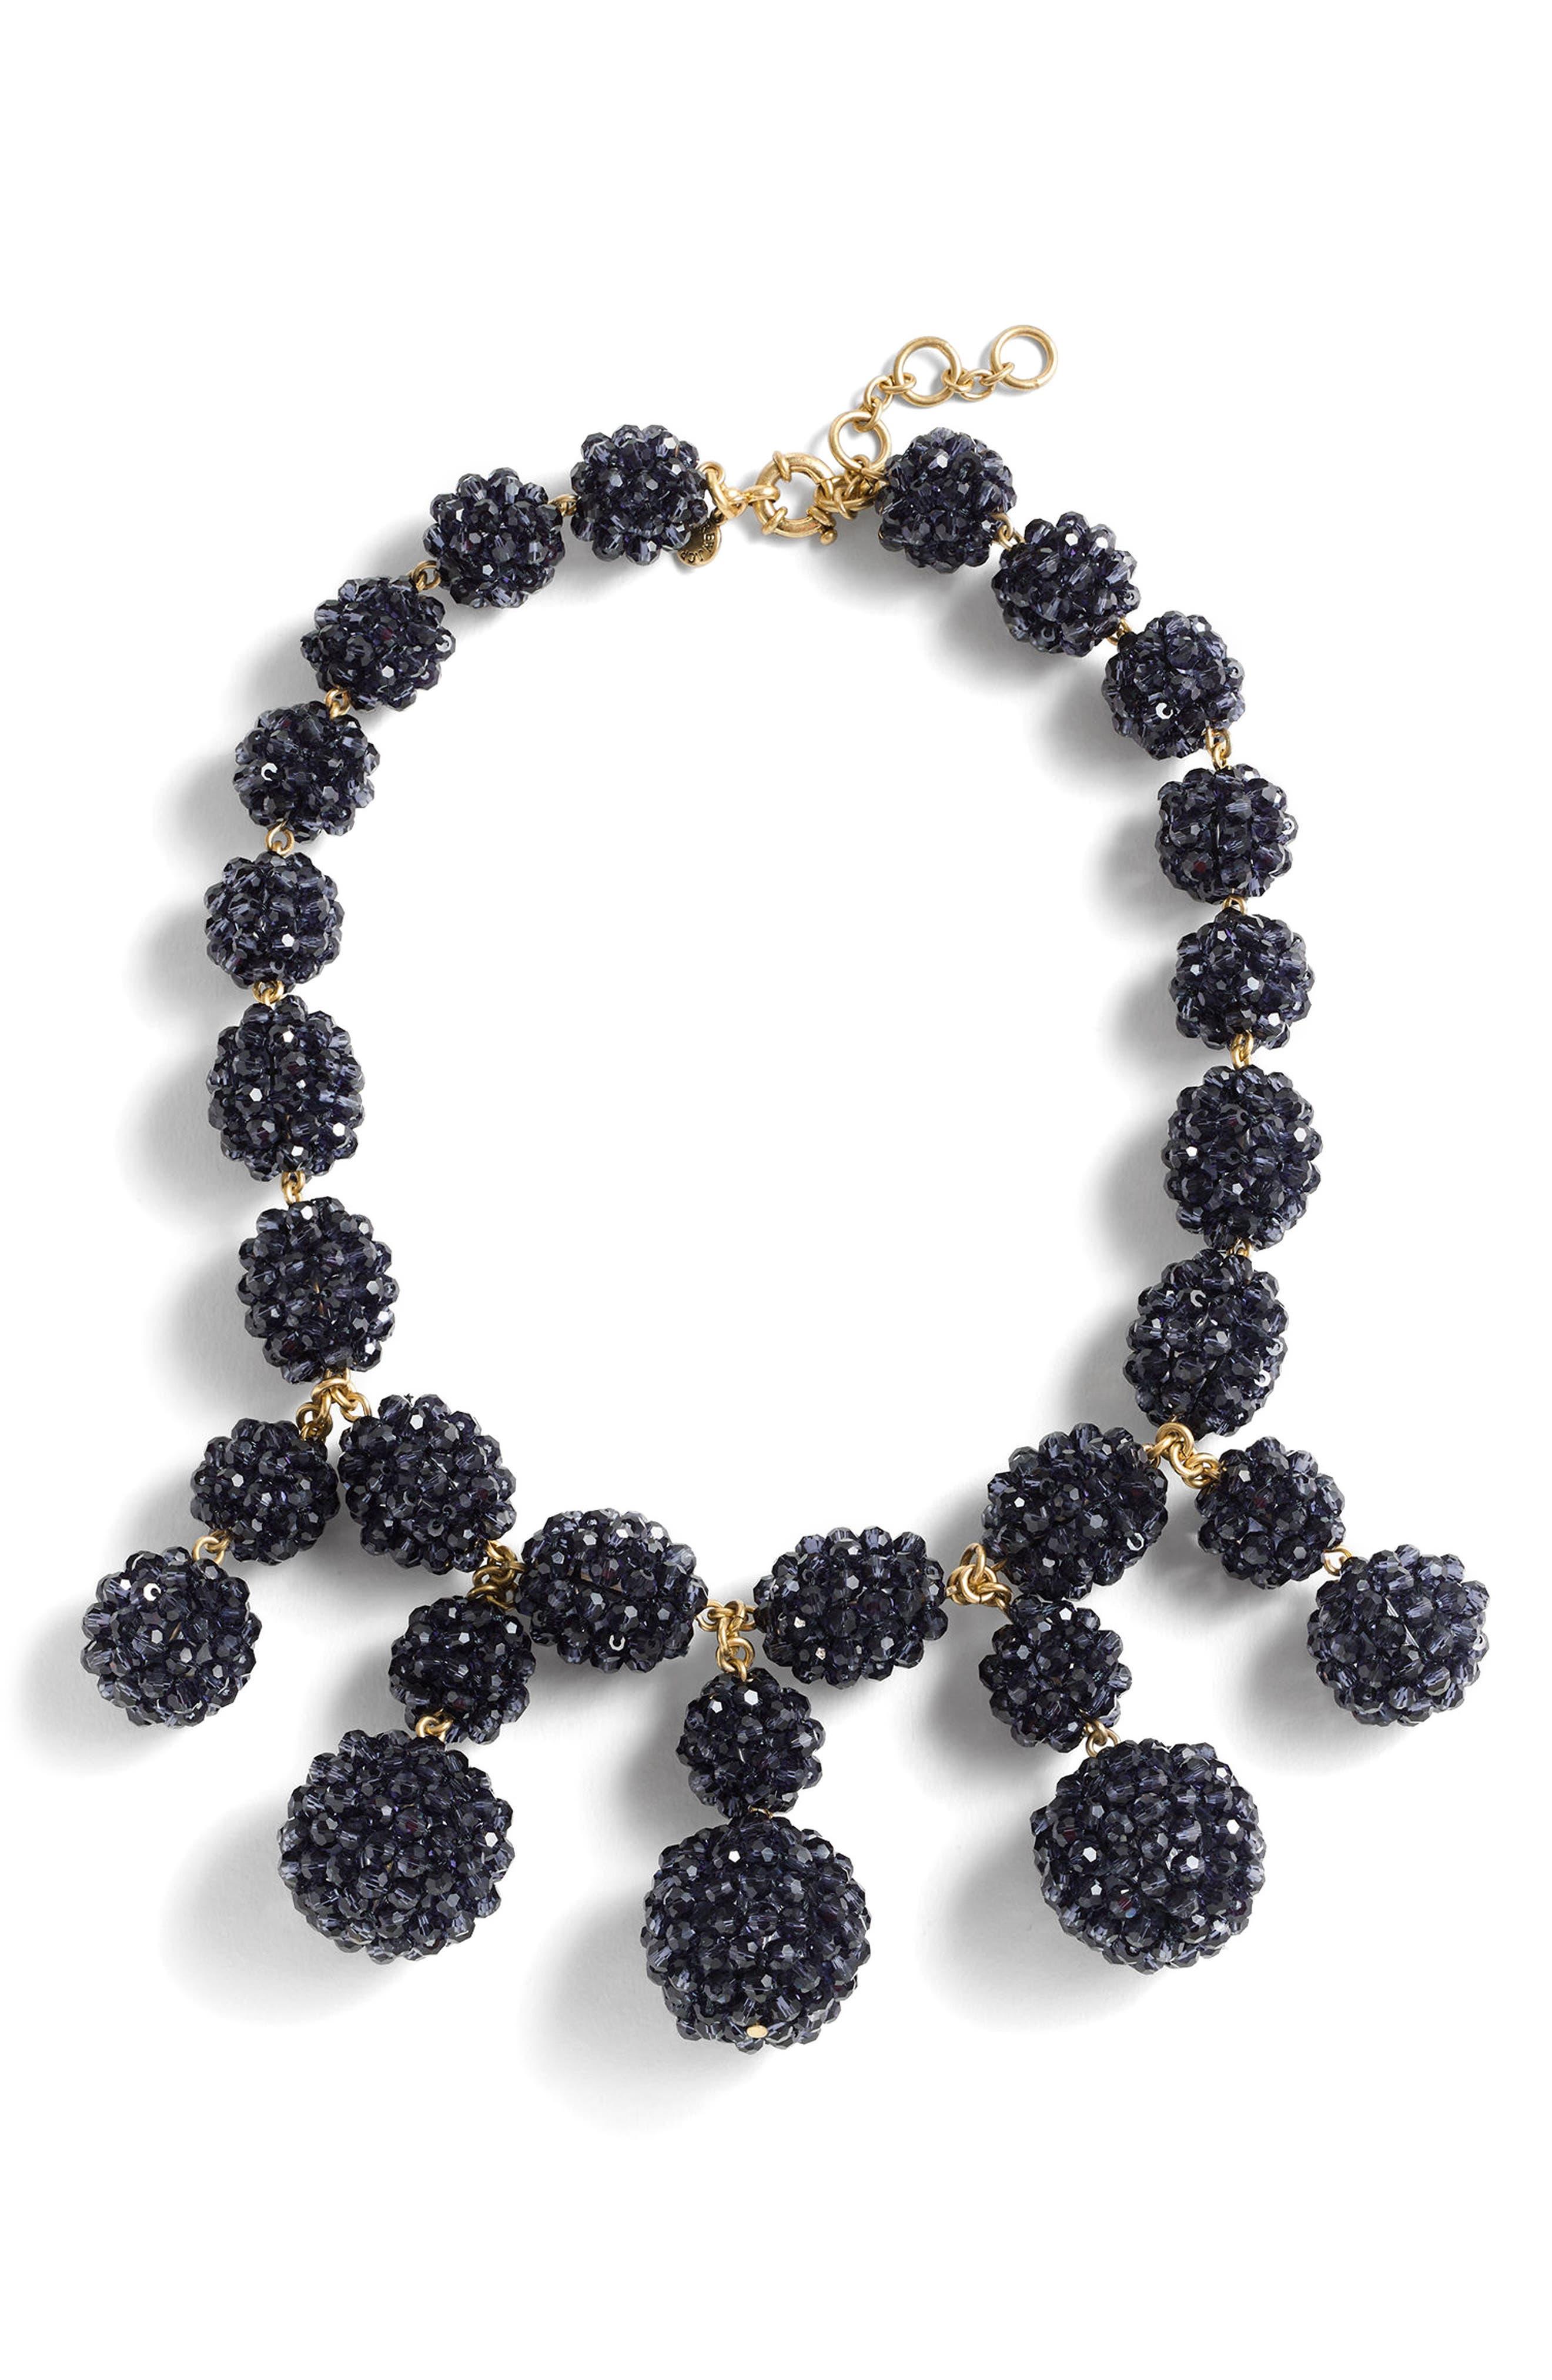 Main Image - J.Crew Blackberry Necklace